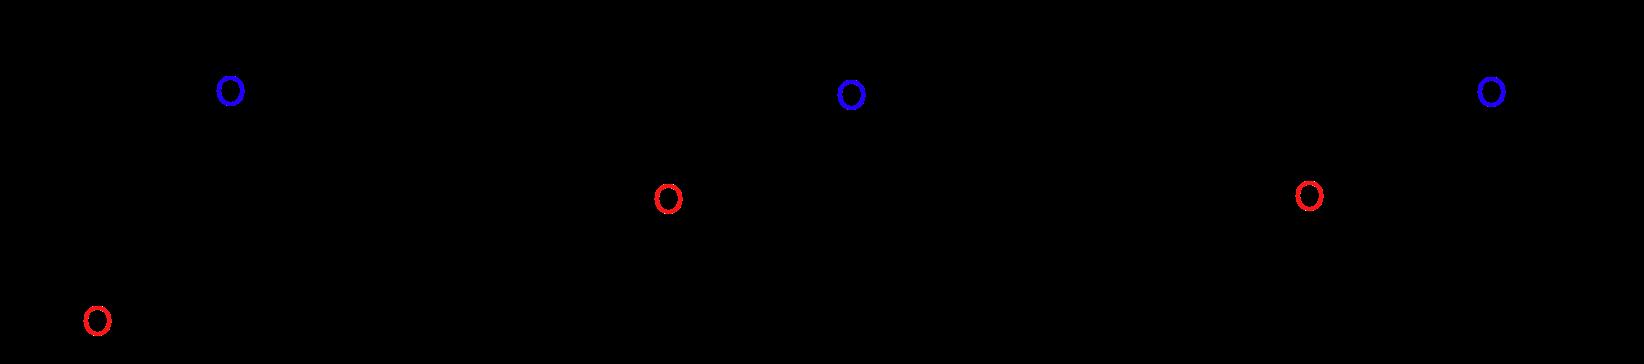 image128.png